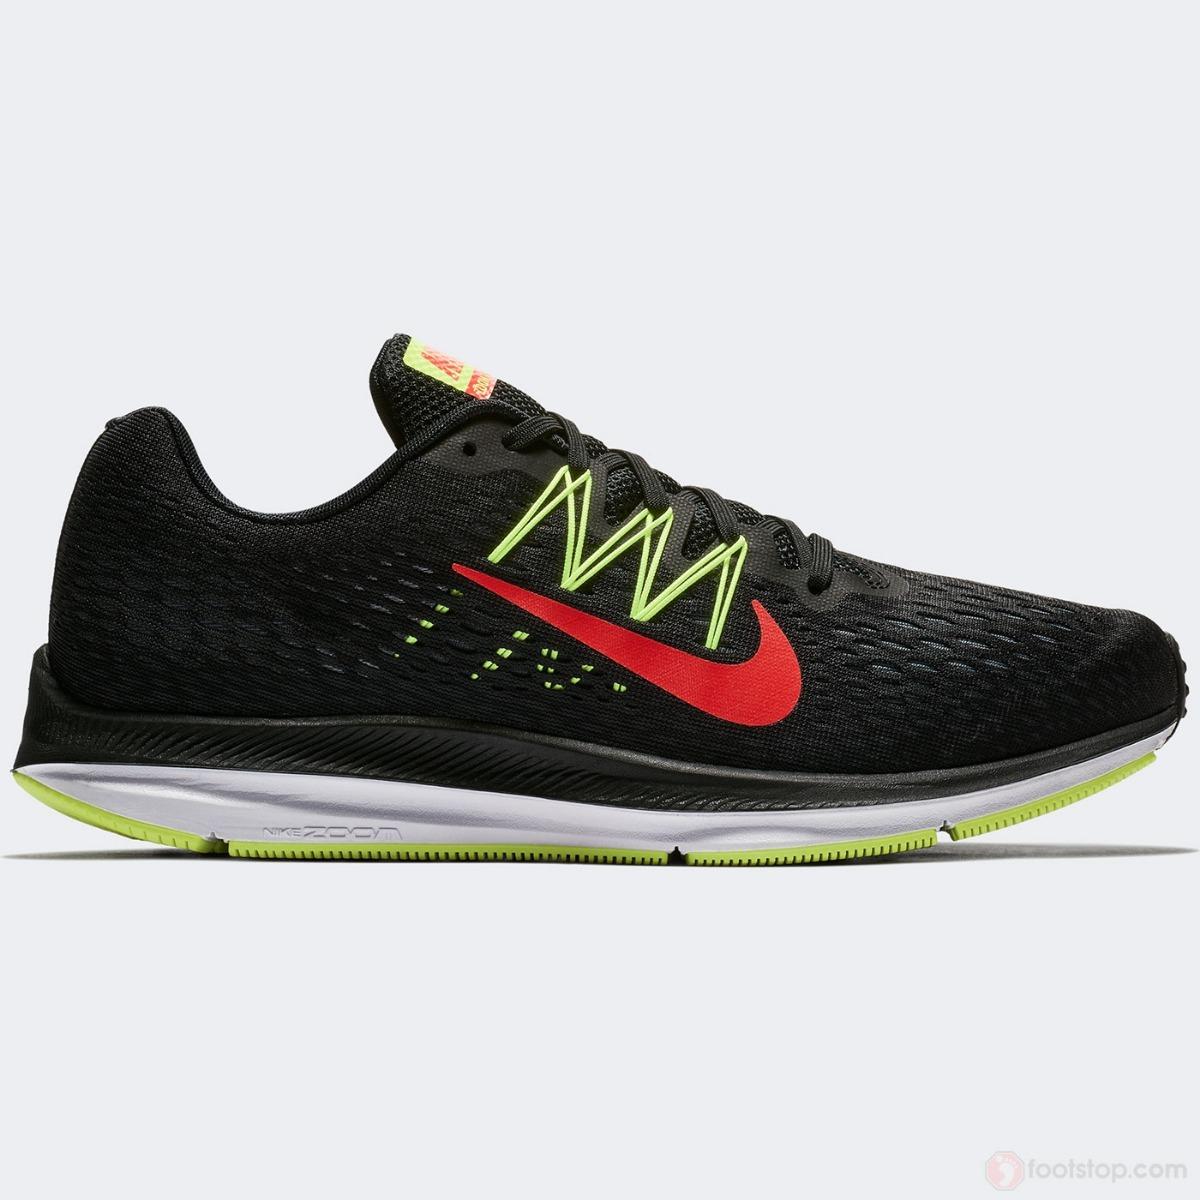 Tenis Nike Air Max Zoom Winflo 5 Running Aa7406 004